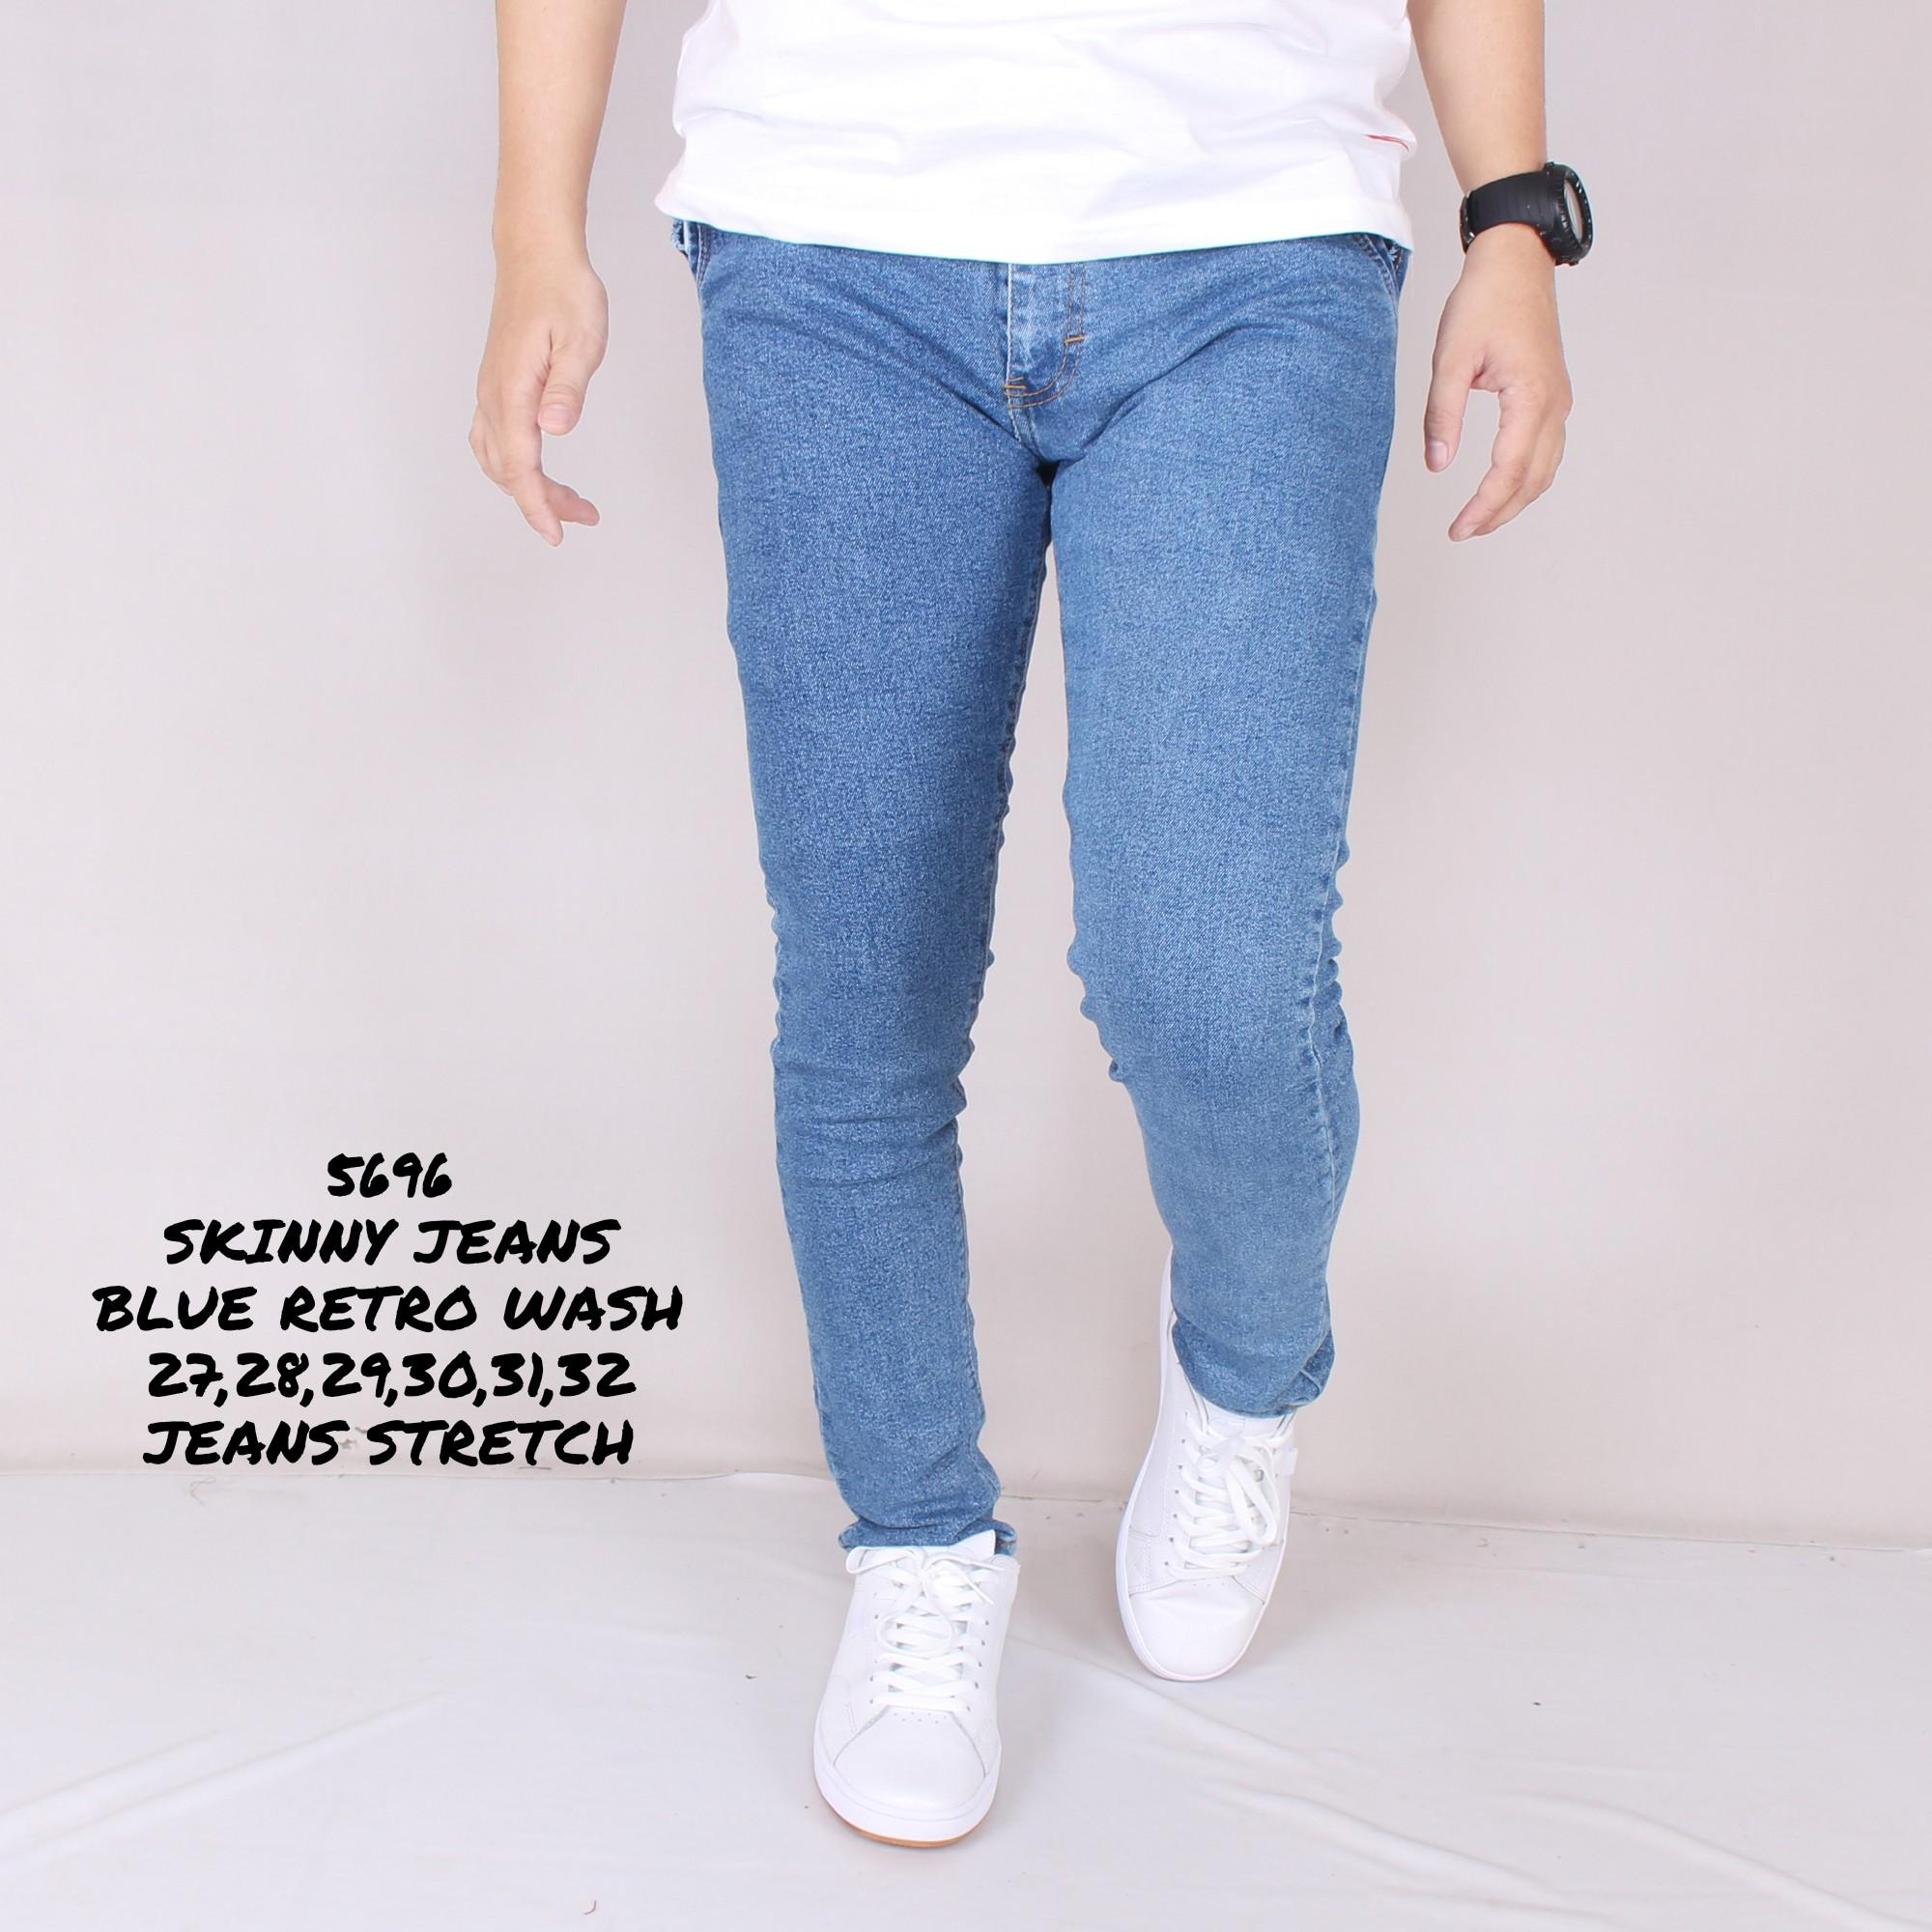 Zoeystore 5696 Celena Jeans Panjang Pria Celana Jeans Skinny Cowok Washing Signal Blue Celana Jeans Slimfit Denim STRETCH